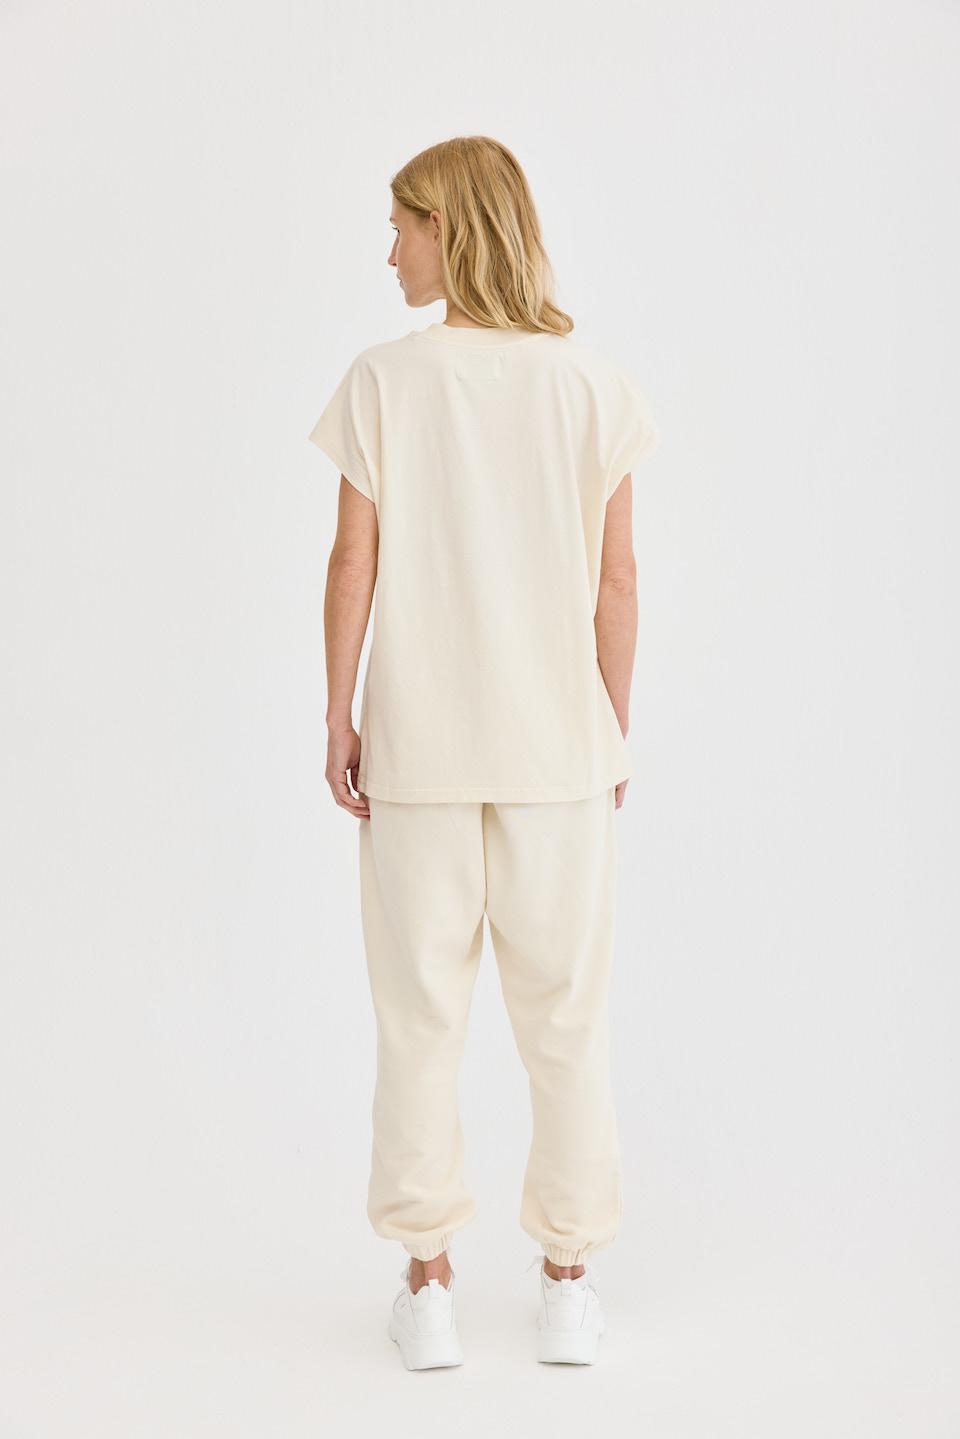 CPH Shirt 1 org. cotton nature - alternative 1